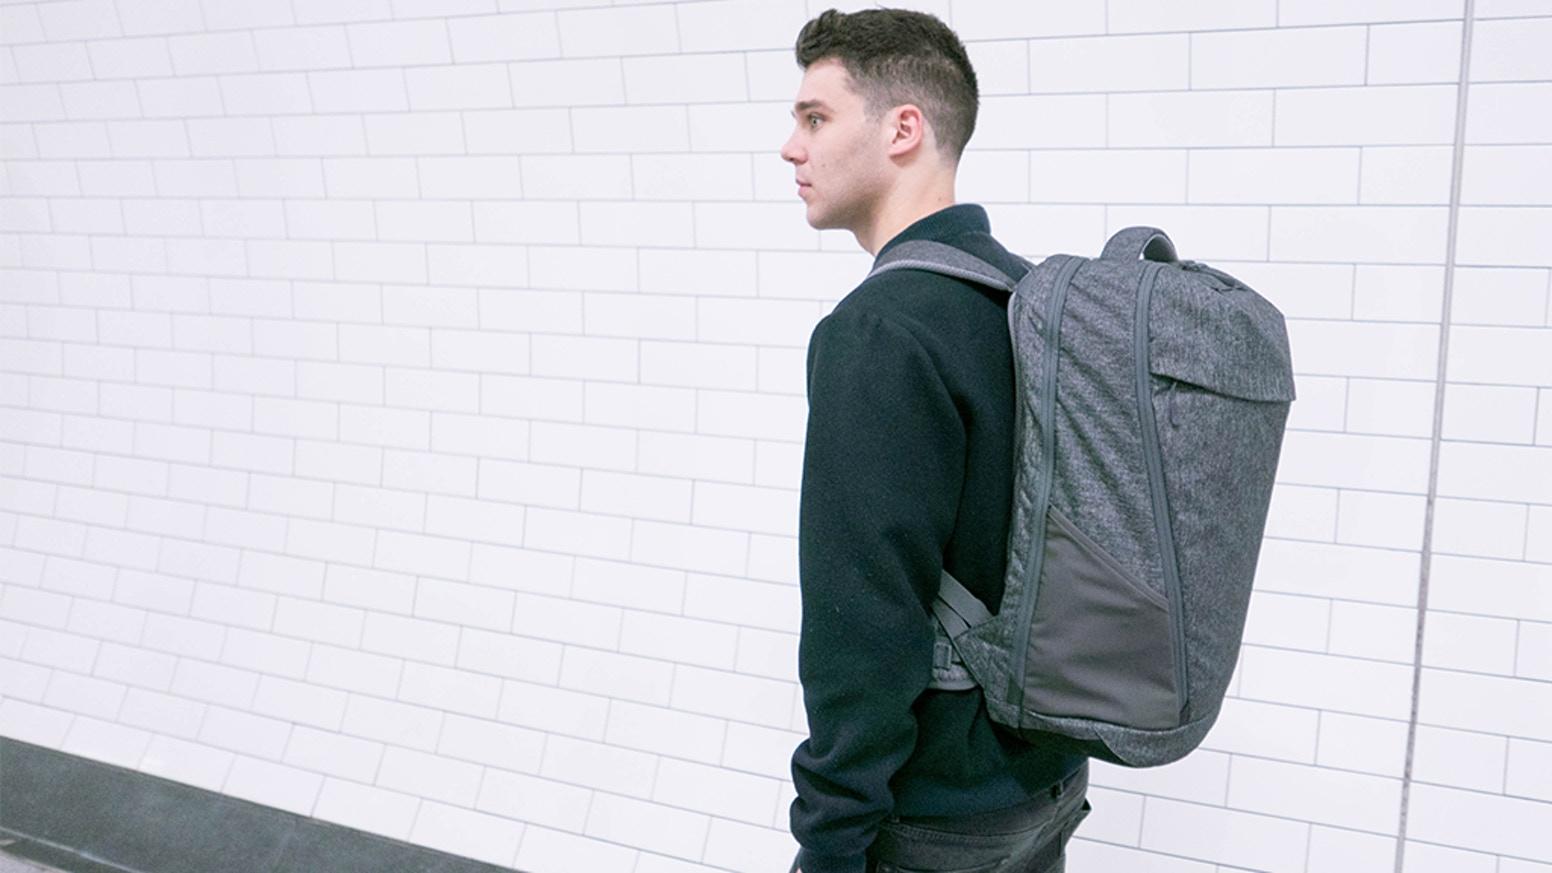 Arcido: Akra & Vaga - Carry-on Luggage System - £49,252 | 321 Backers